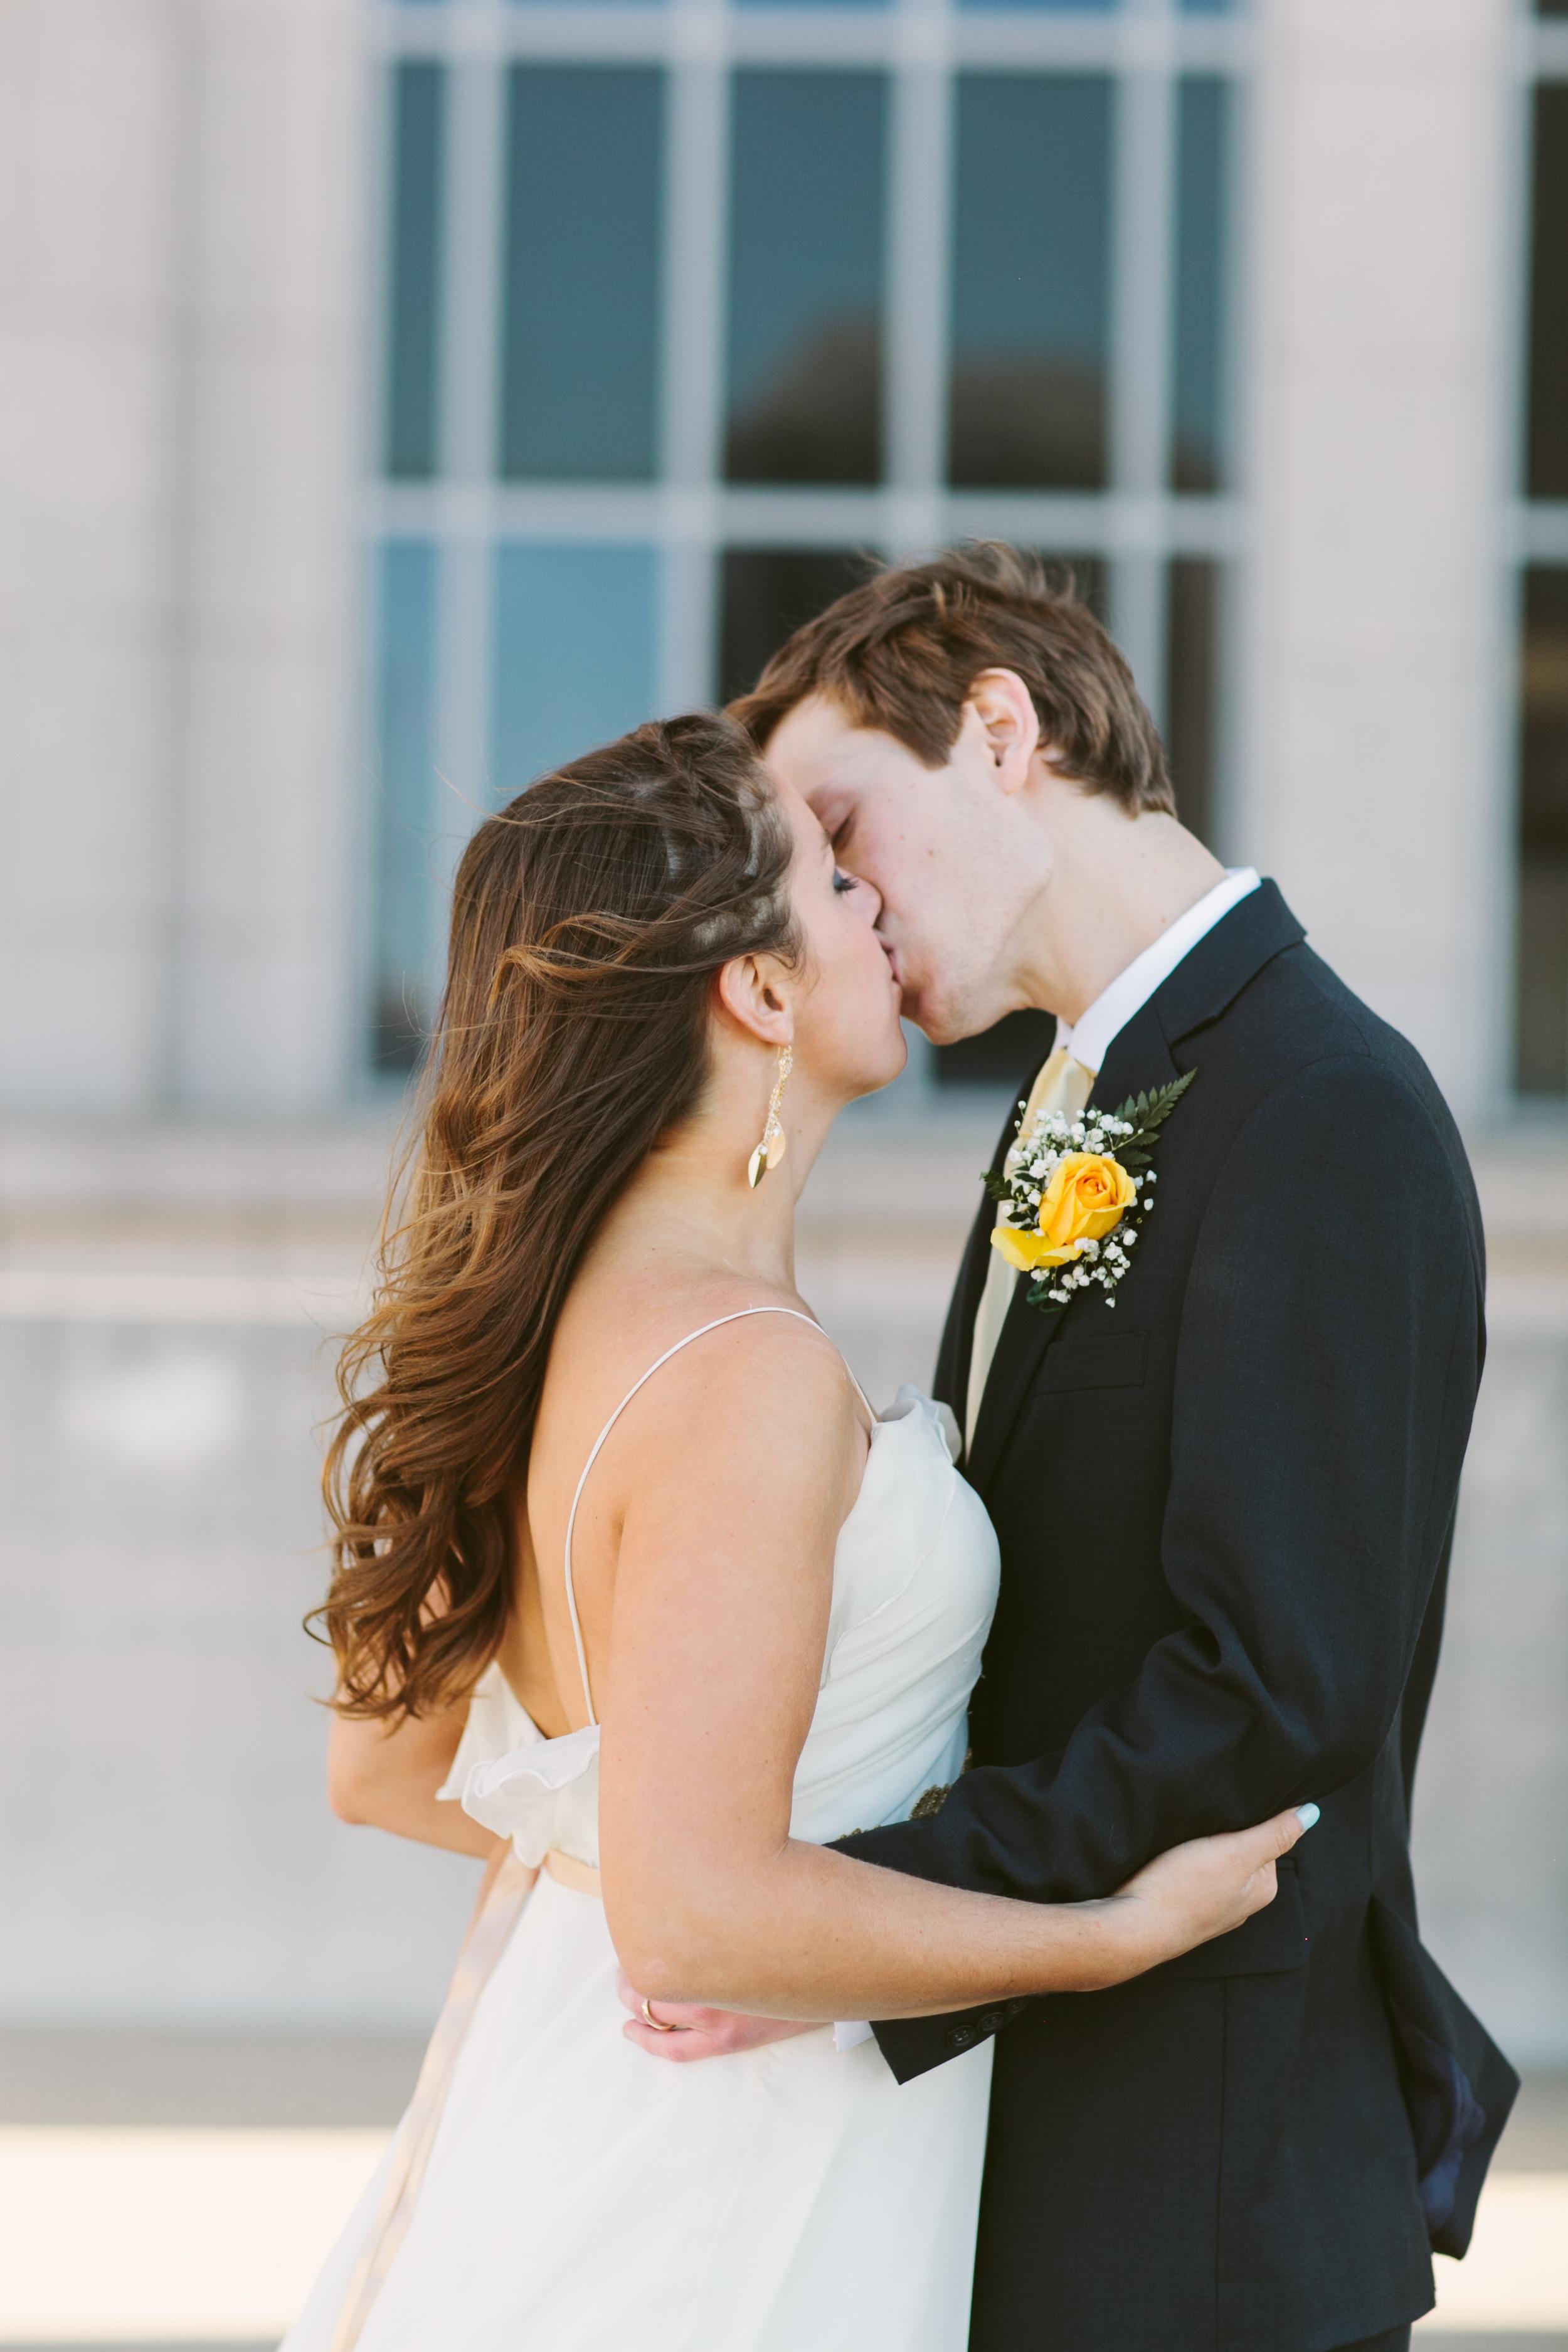 Kathryn-McCrary-Photography-Atlanta-Wedding-Photographer-47.jpg